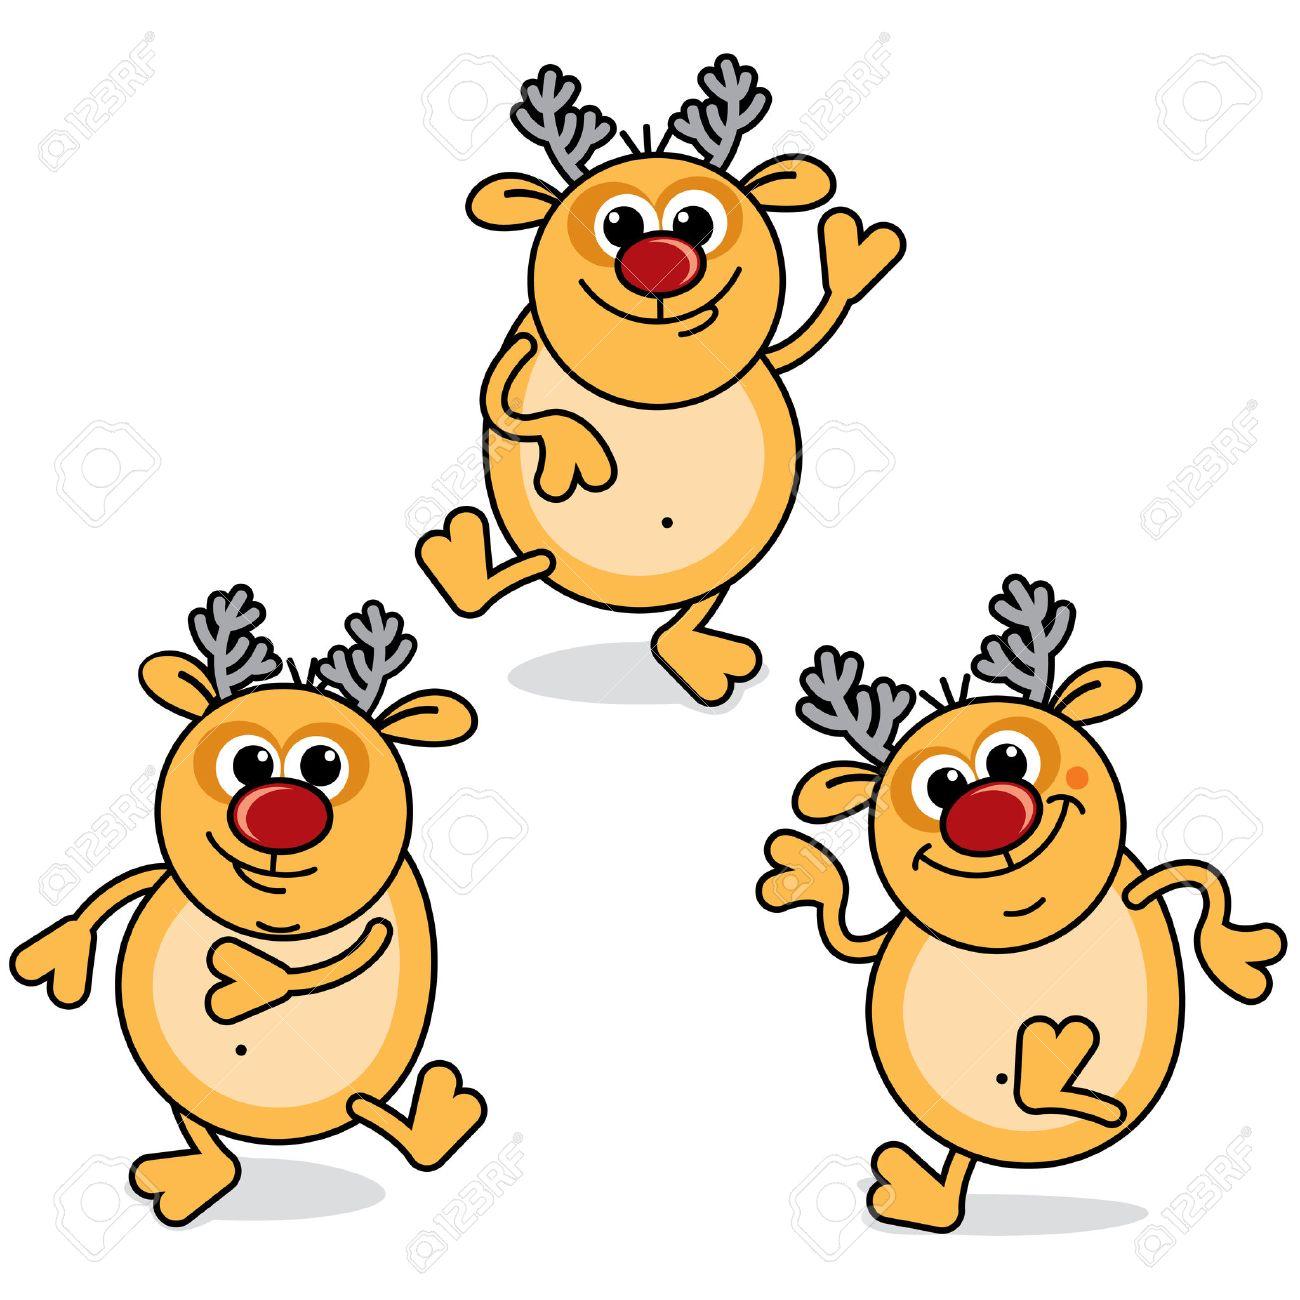 Christmas Dancing Cartoon.Funny Cartoon Dancing Rudolph Christmas Icons